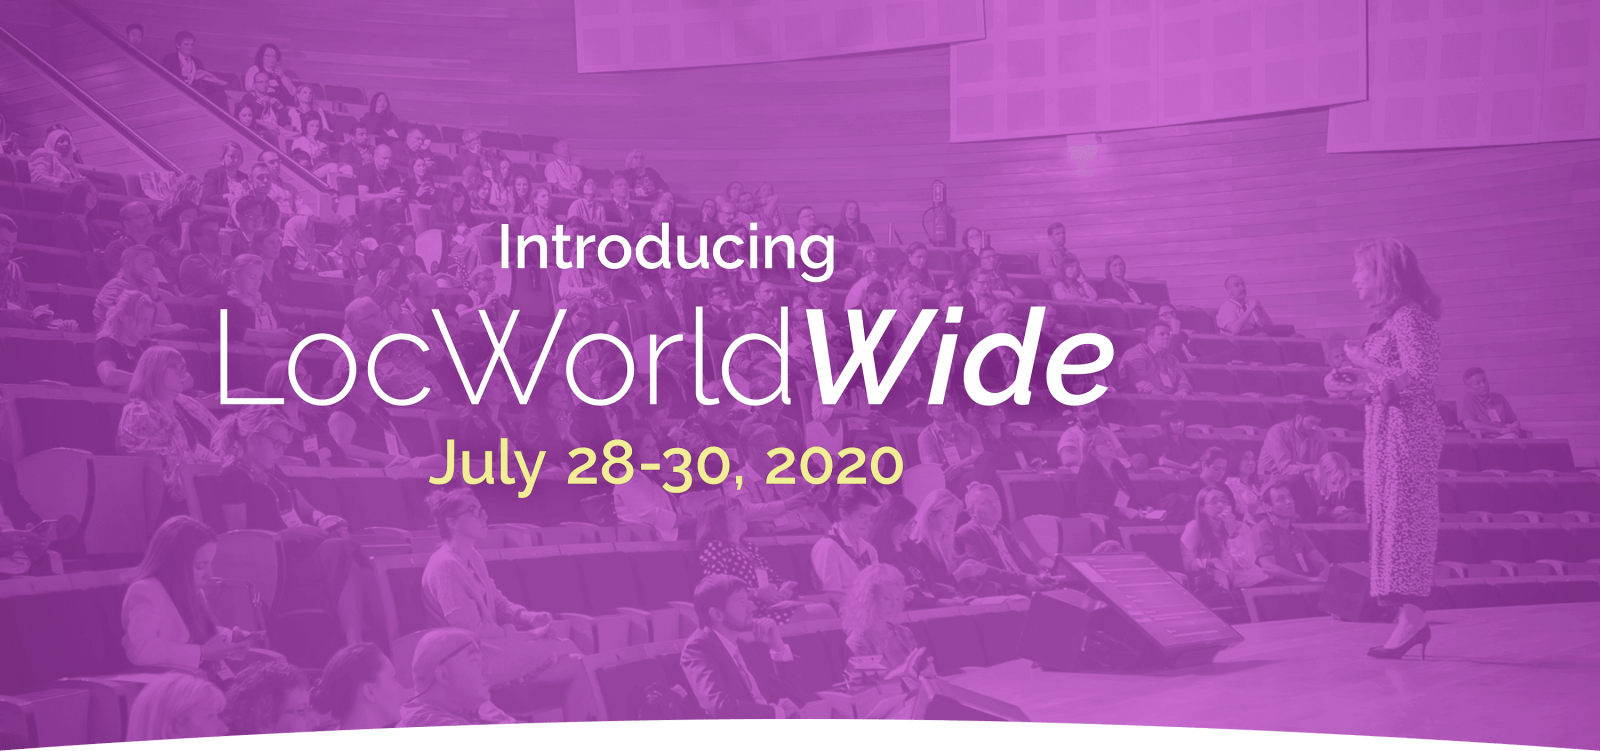 LocWorldWide42 Conference Program